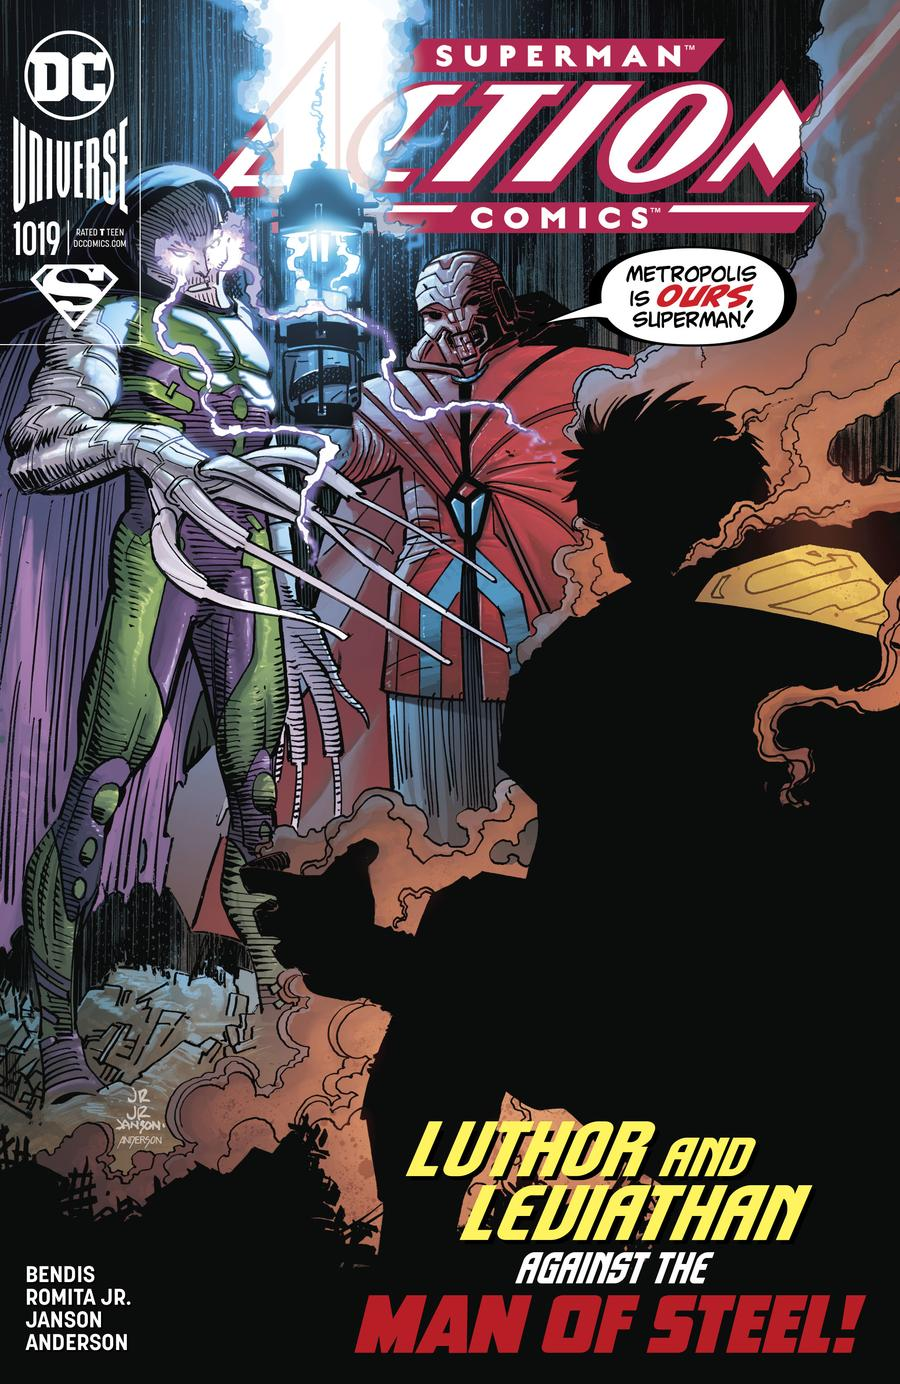 Action Comics Vol 2 #1019 Cover A Regular John Romita Jr & Klaus Janson Cover